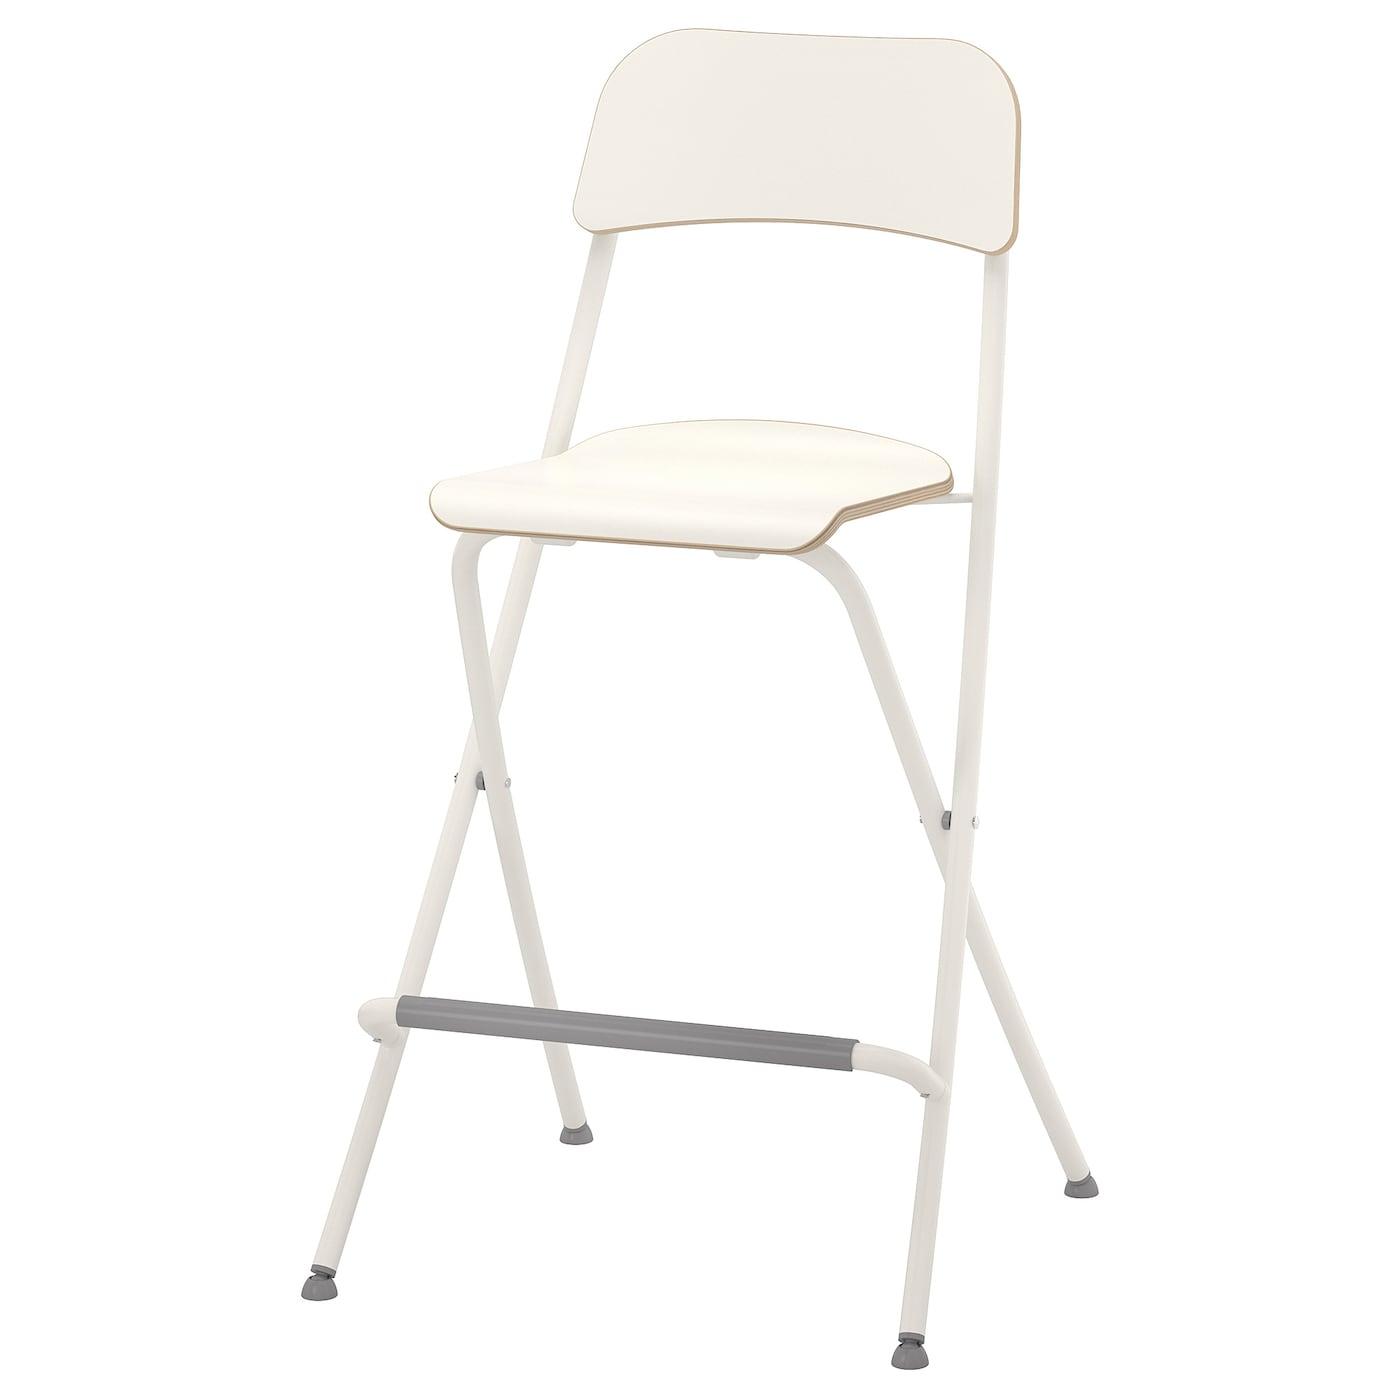 FRANKLIN Bar stool with backrest, foldable   white/white 9 cm